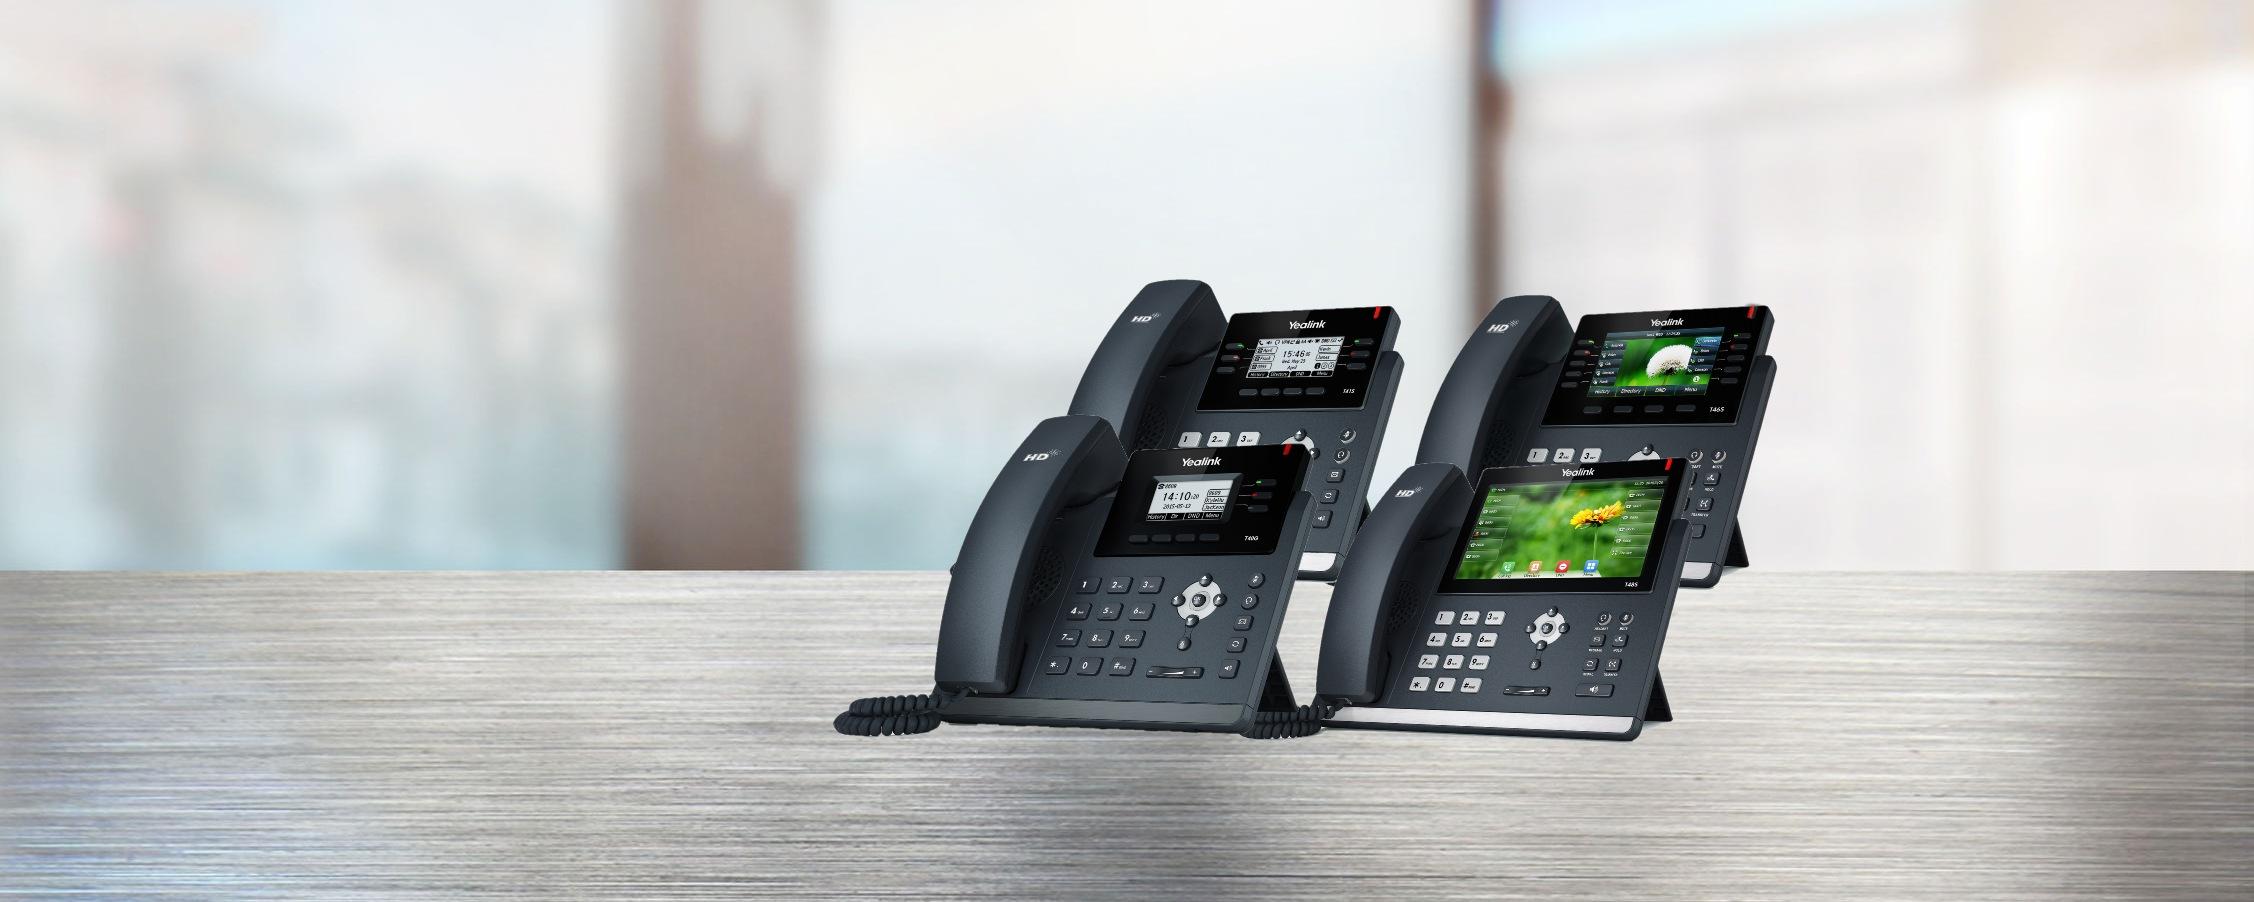 yealink telefony T4x